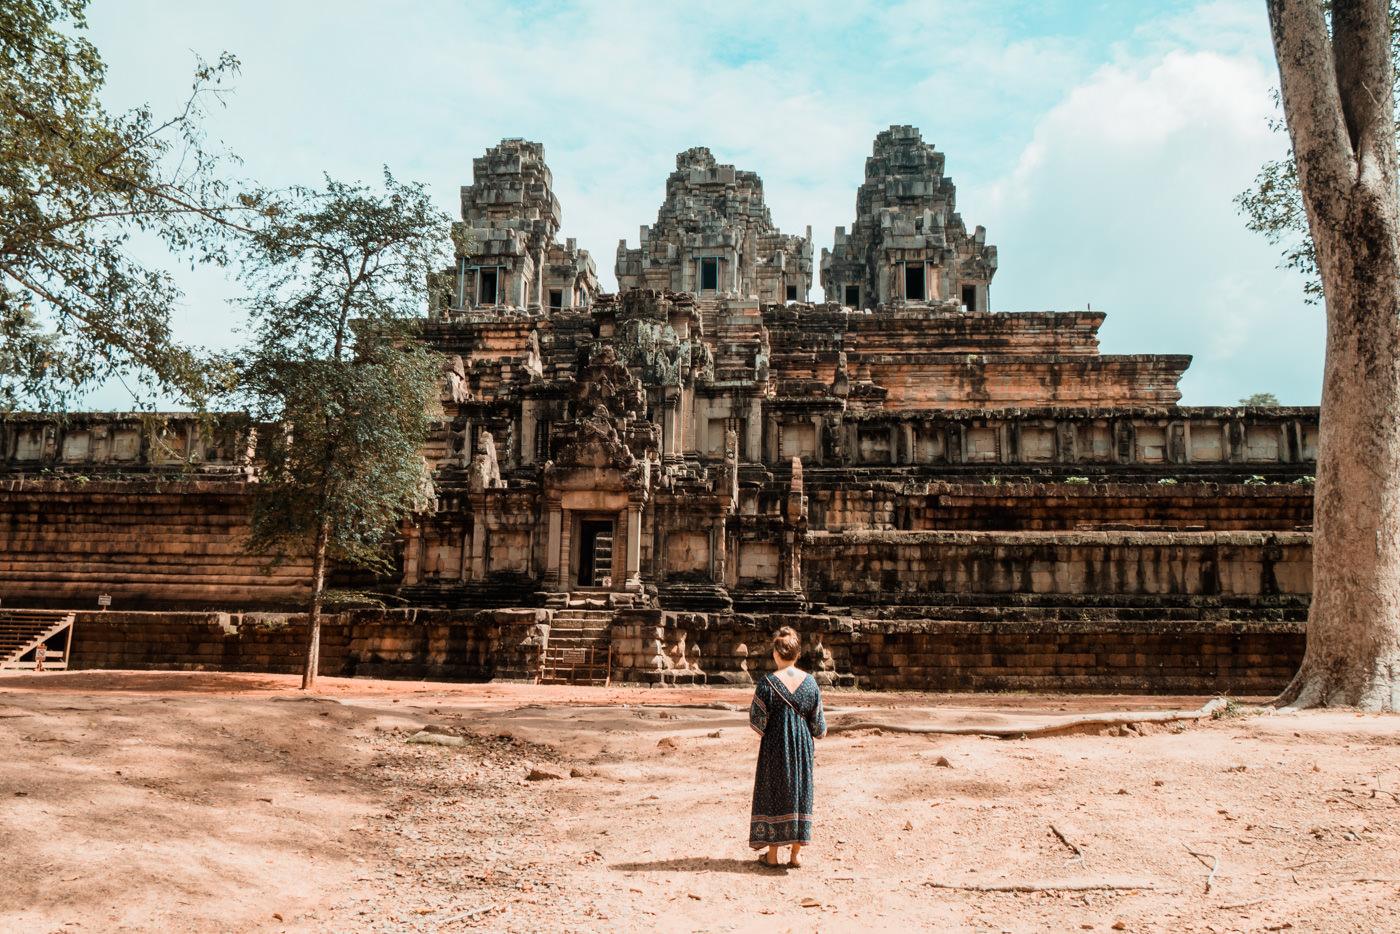 Julia vor dem Ta Keo Tempel in Angkor, Kambodscha